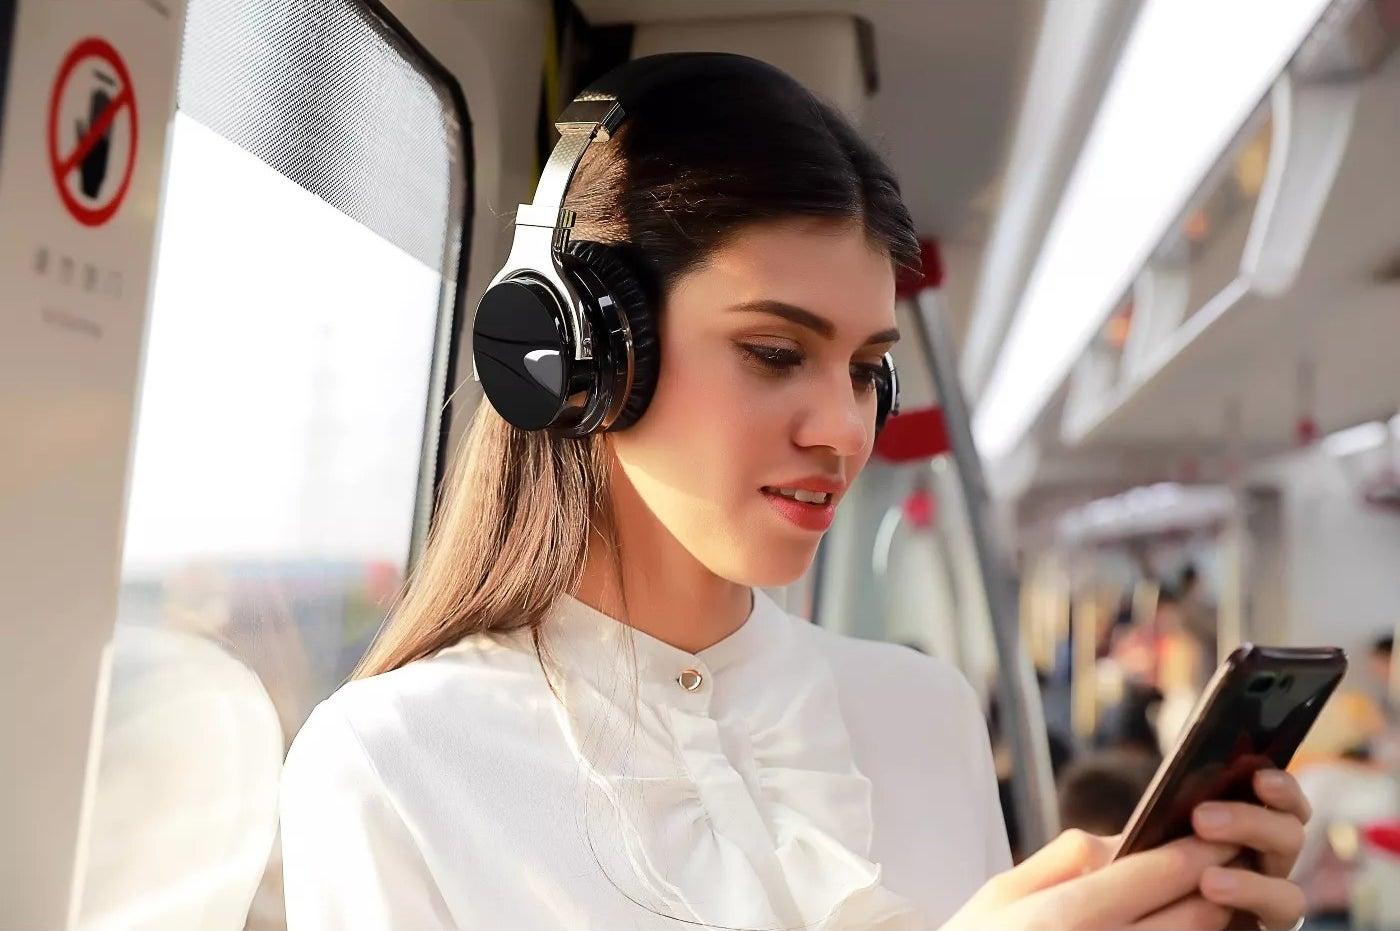 A model wearing the headphones on public transportation